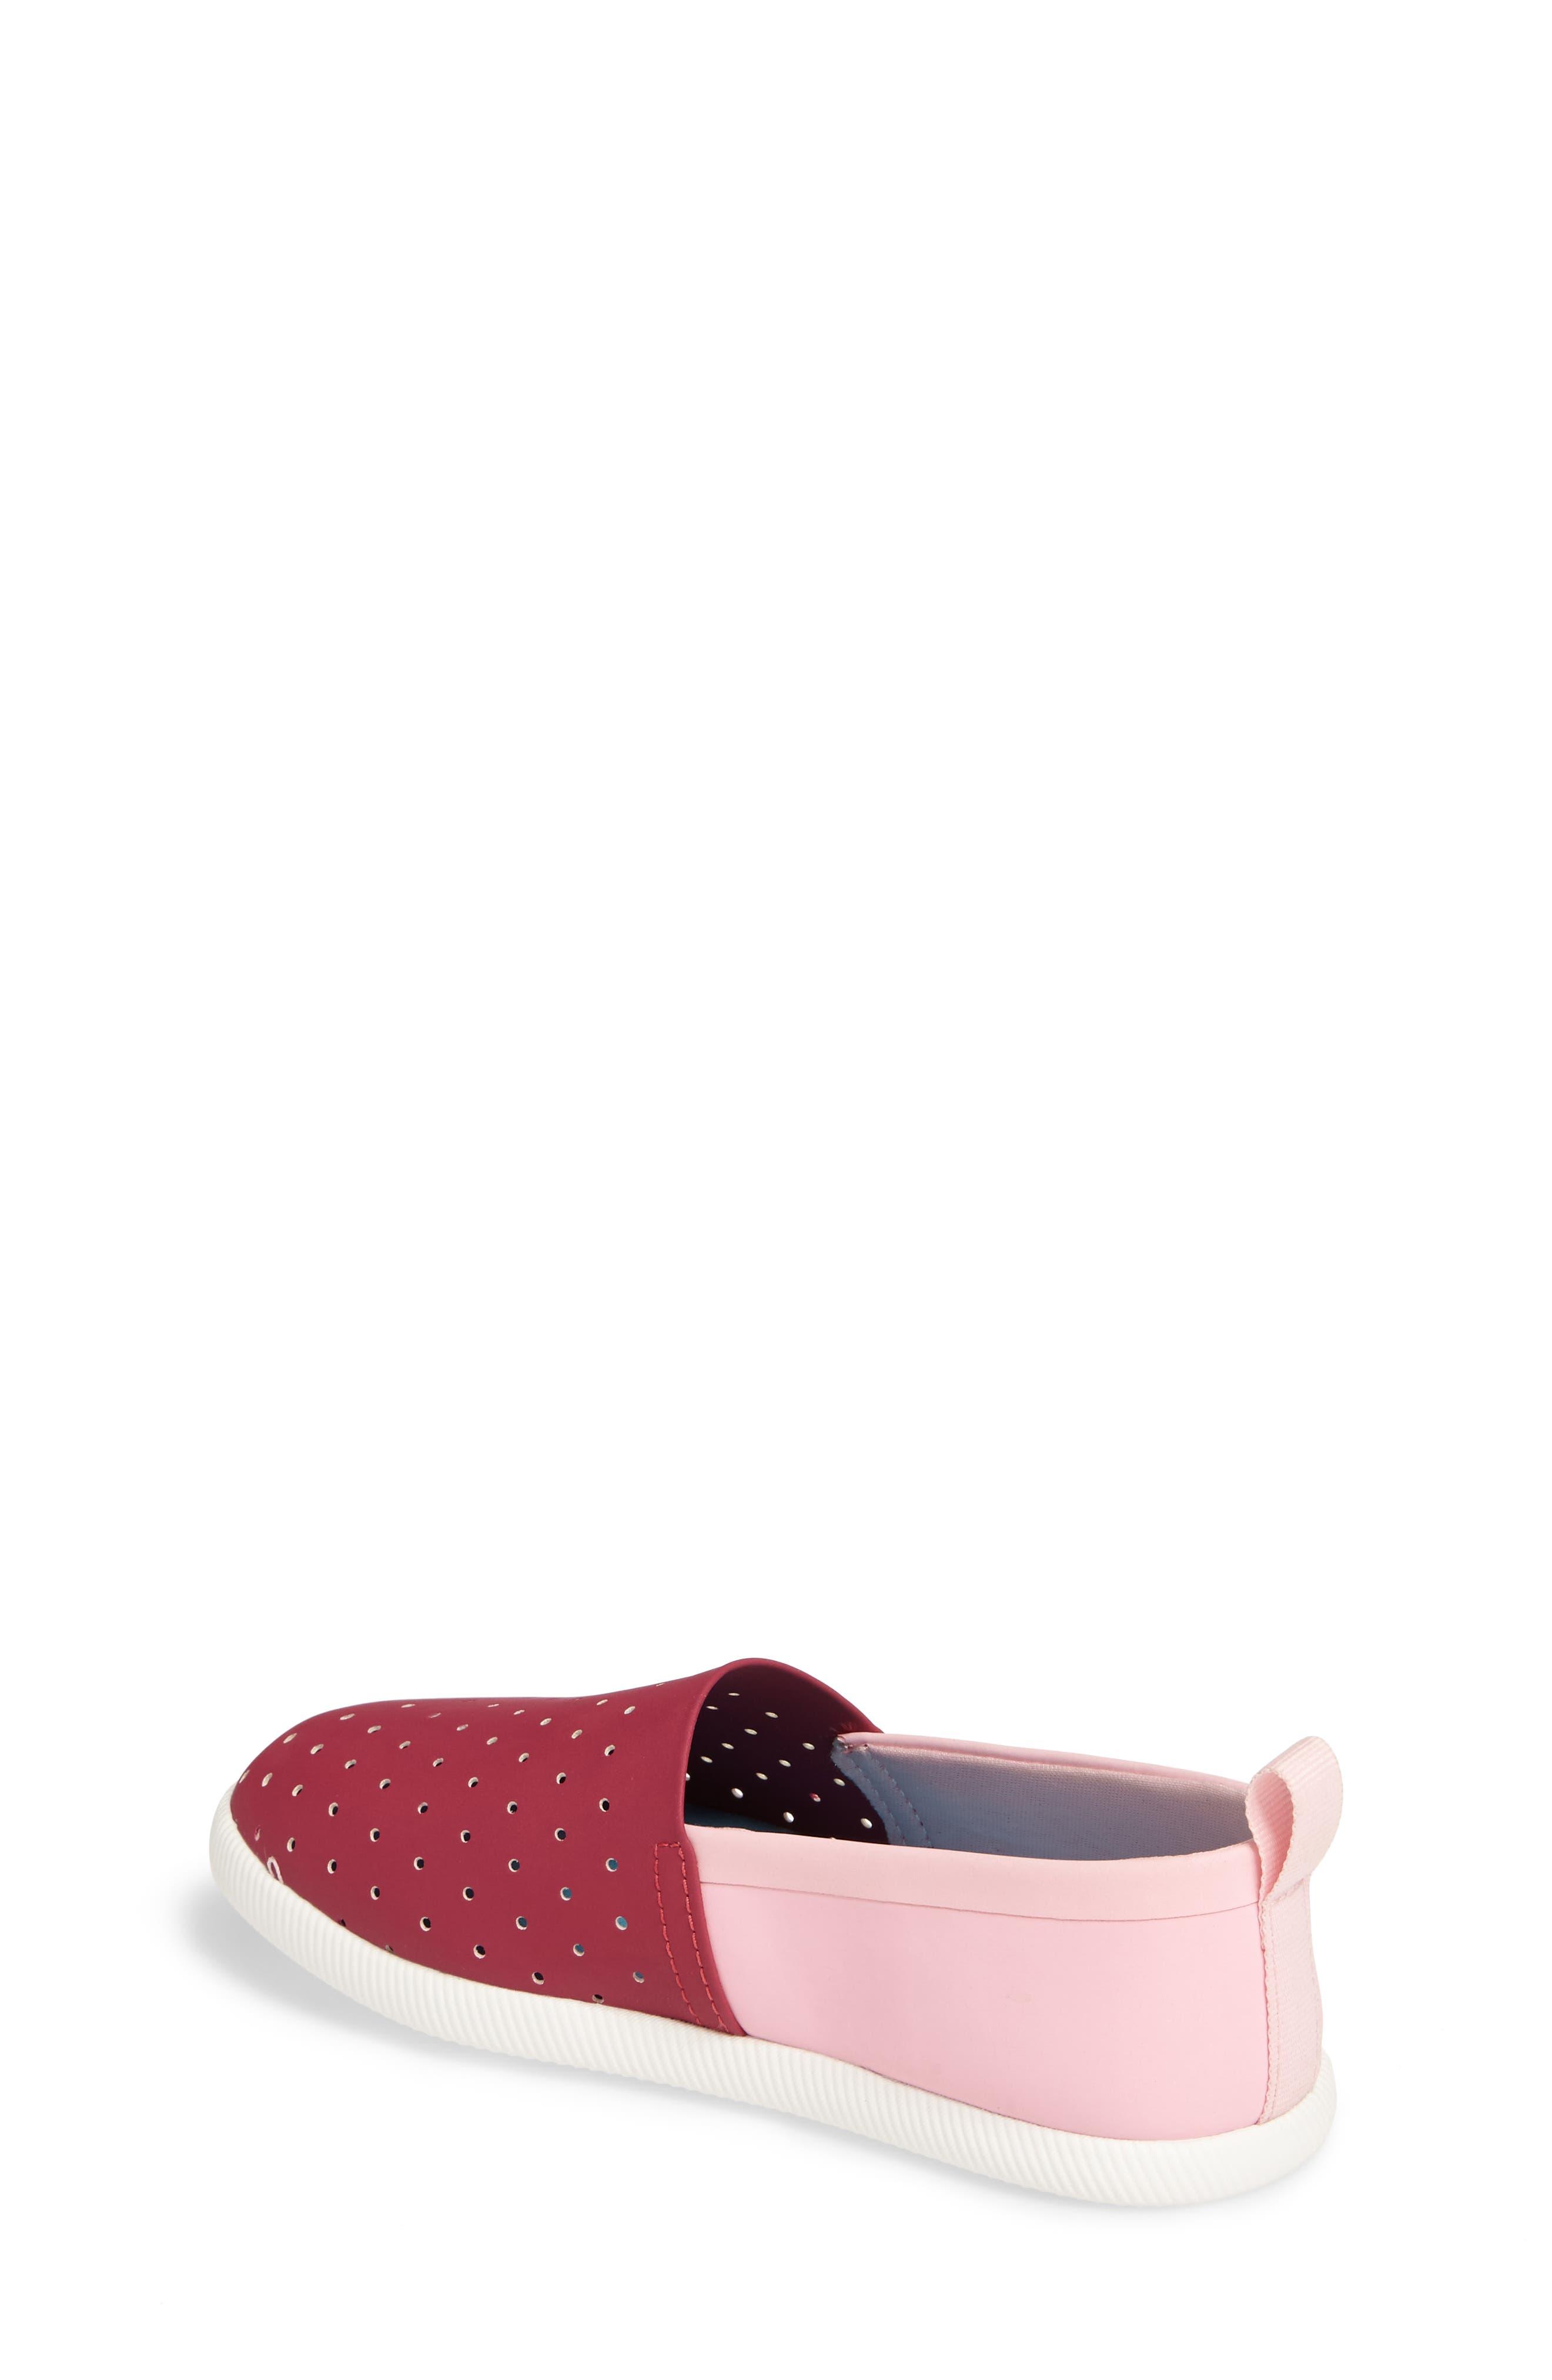 Alternate Image 2  - Native Shoes 'Venice' Slip-On (Baby, Walker, Toddler & Little Kid)